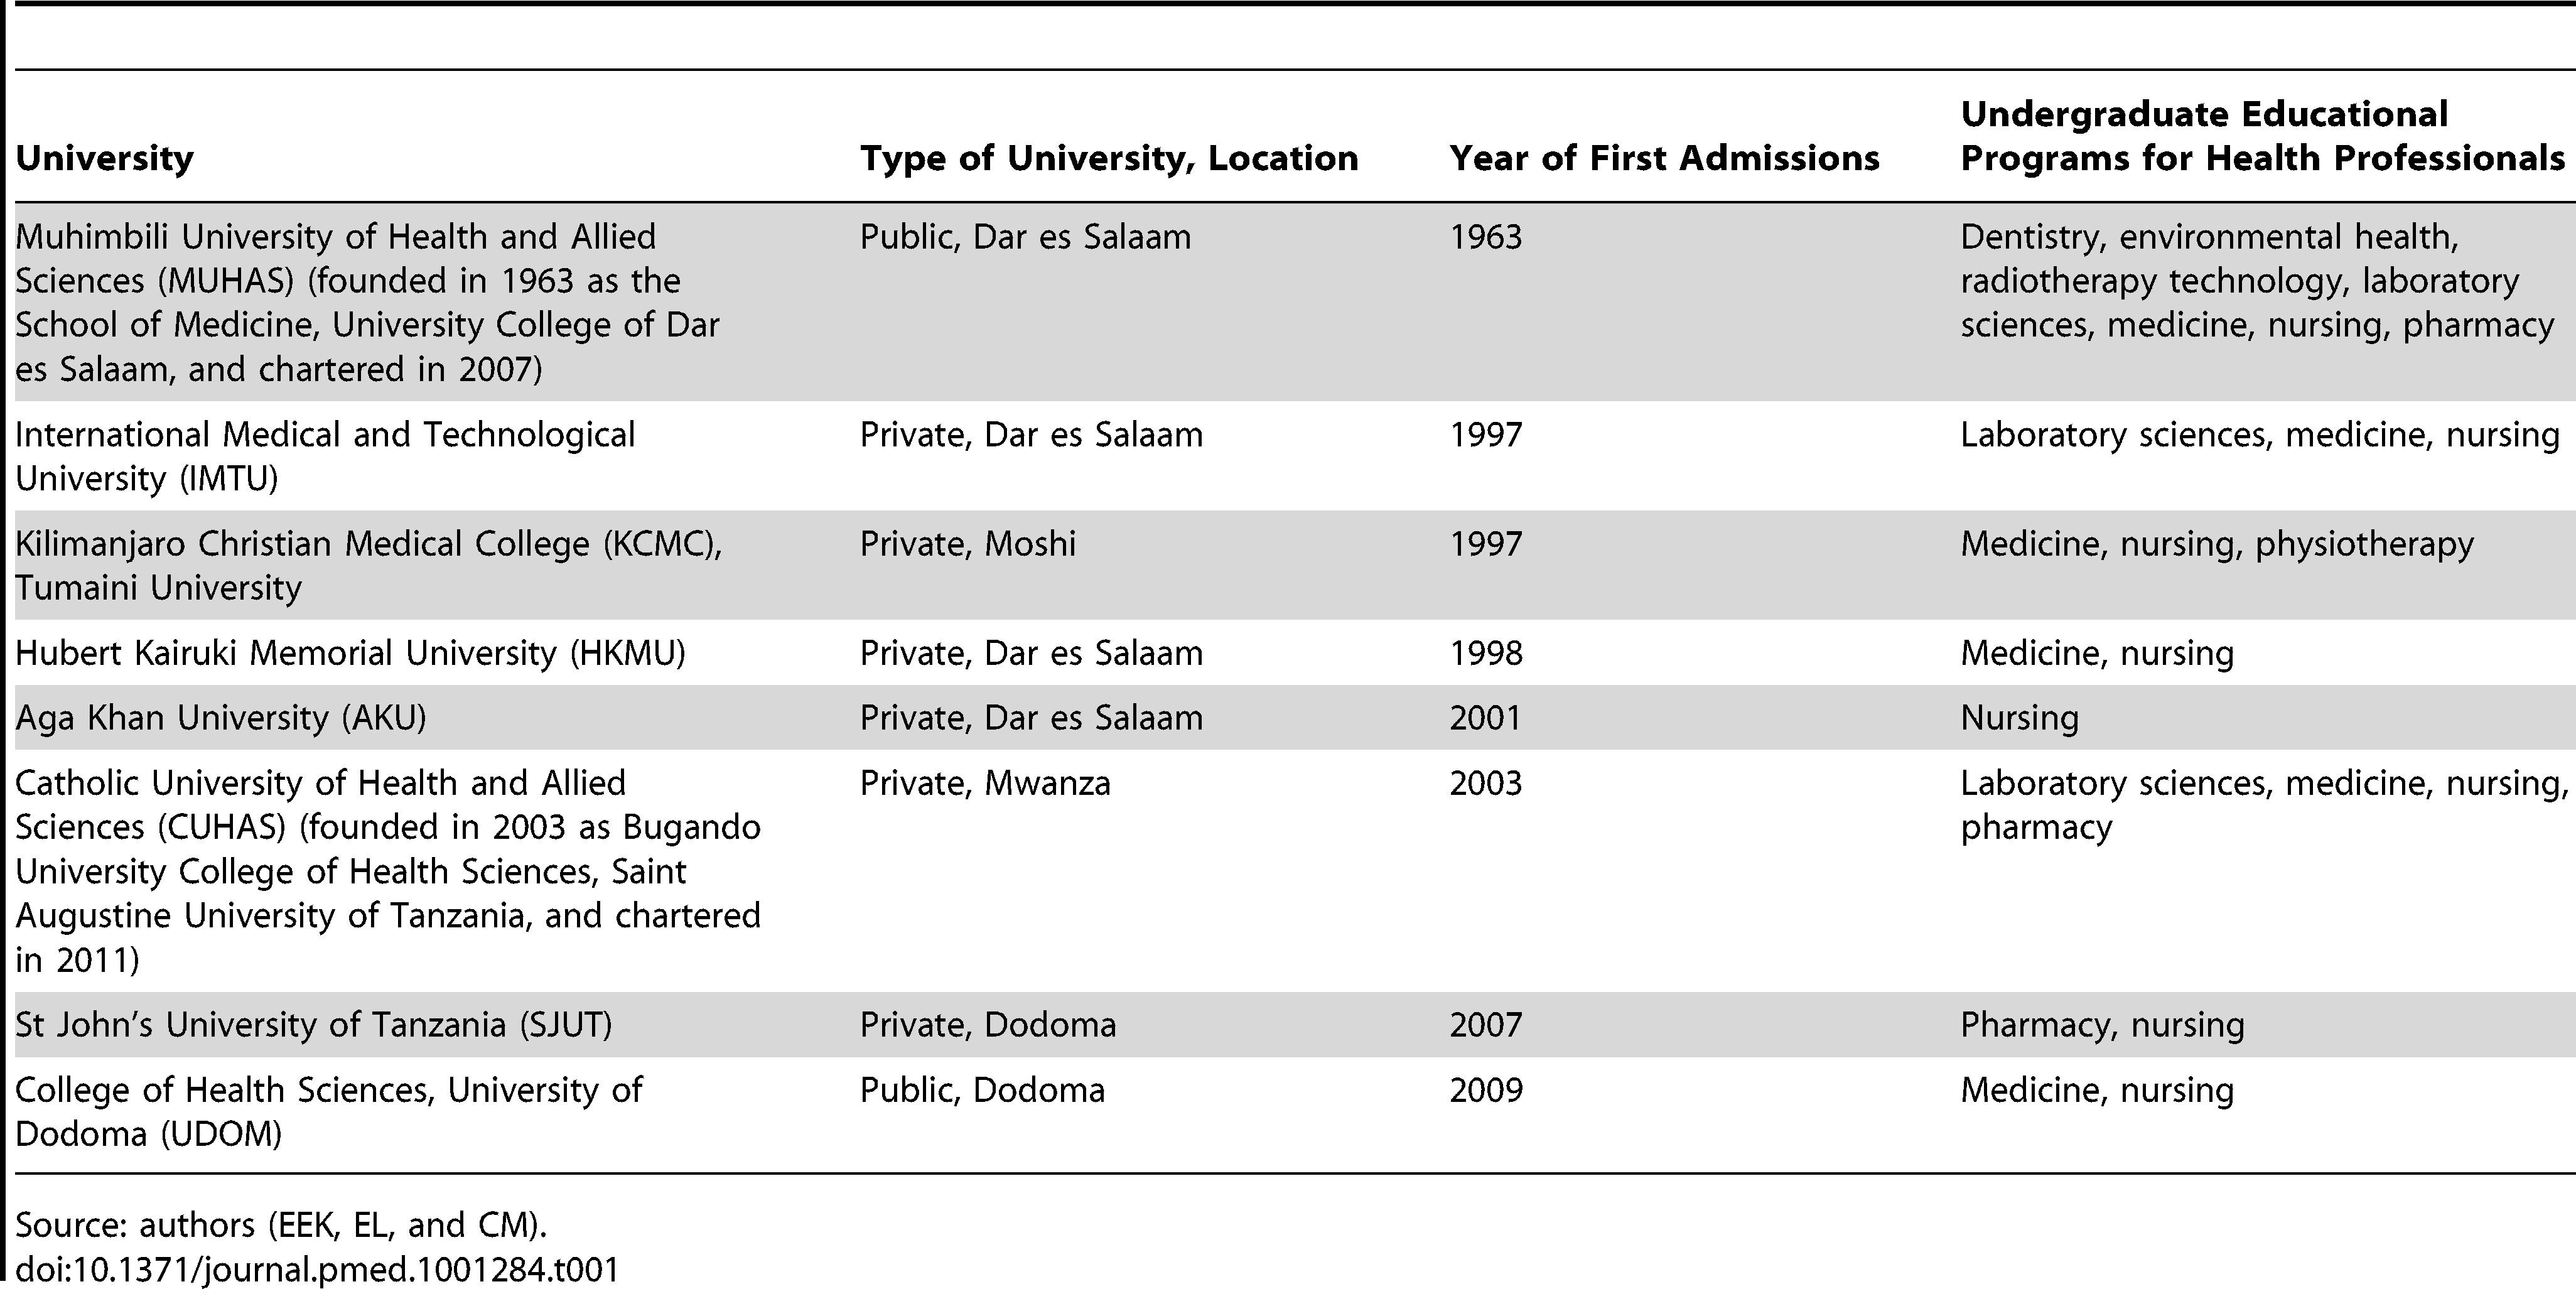 Universities graduating health professionals in Tanzania.